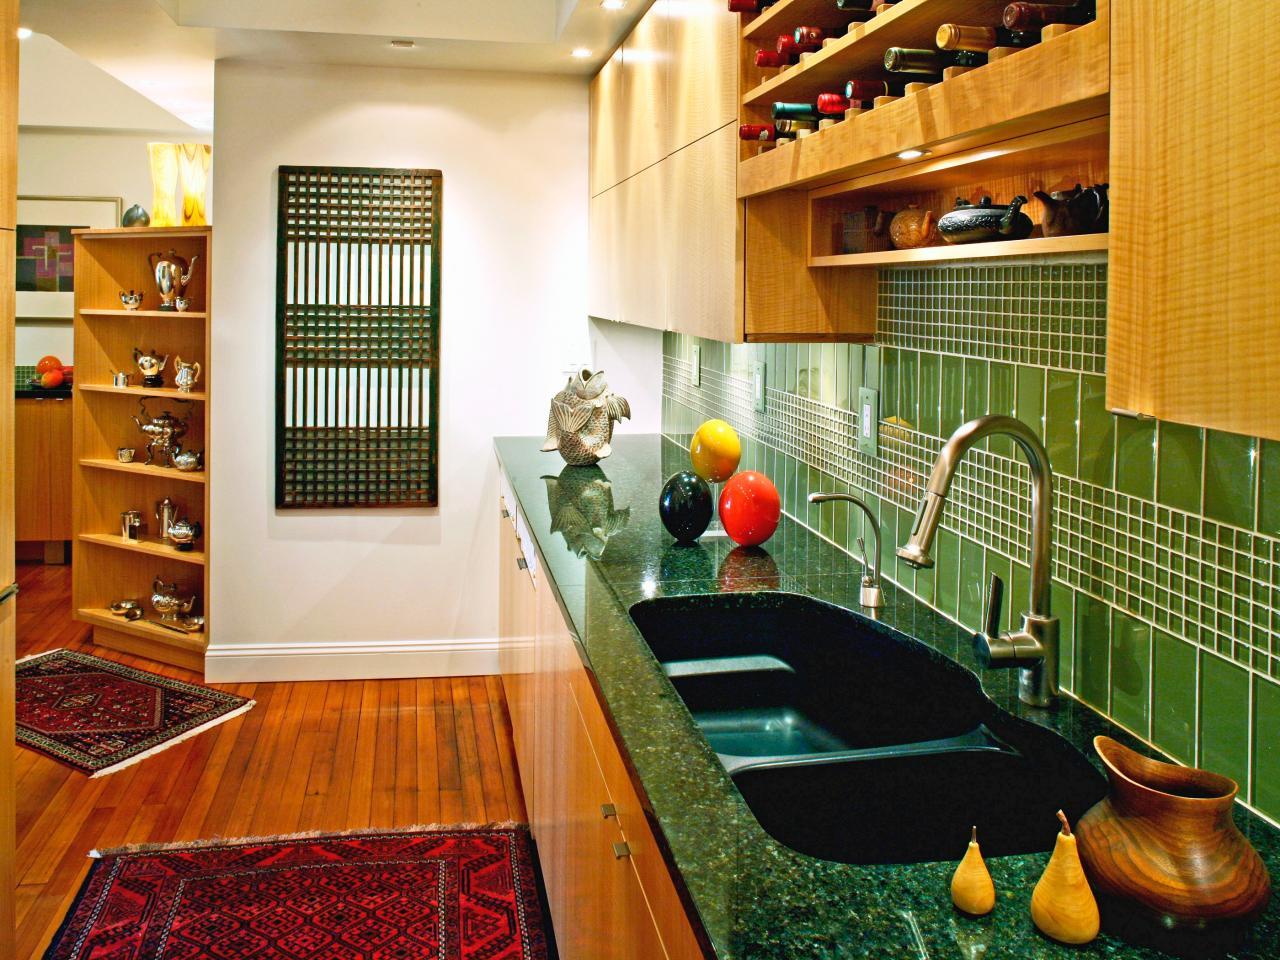 Colored wash basin